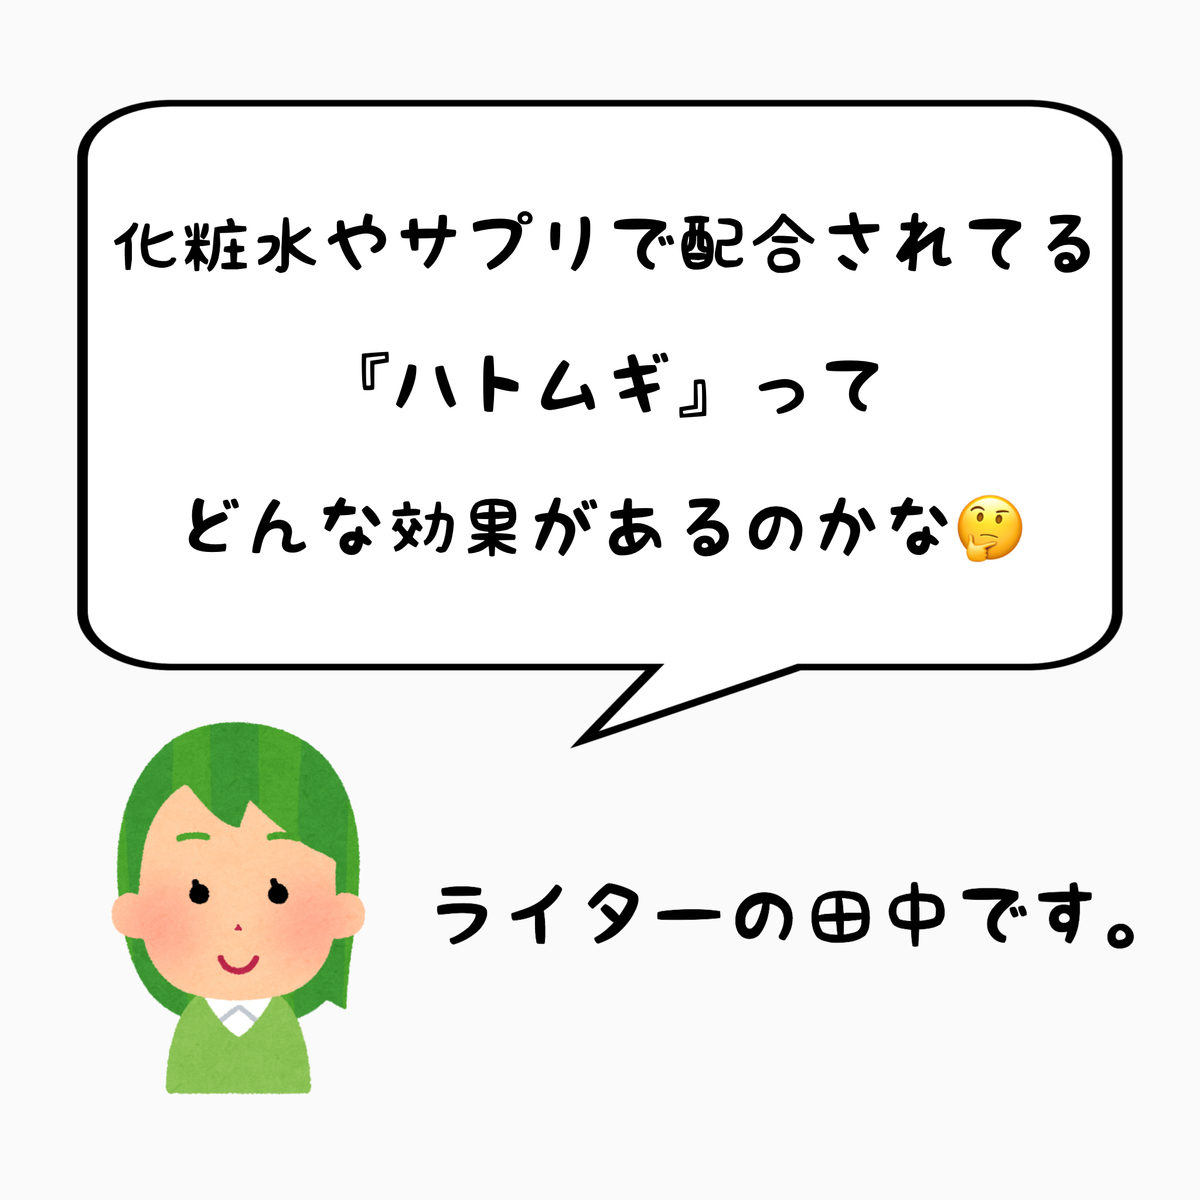 f:id:nokonoko_o:20200929213329j:plain